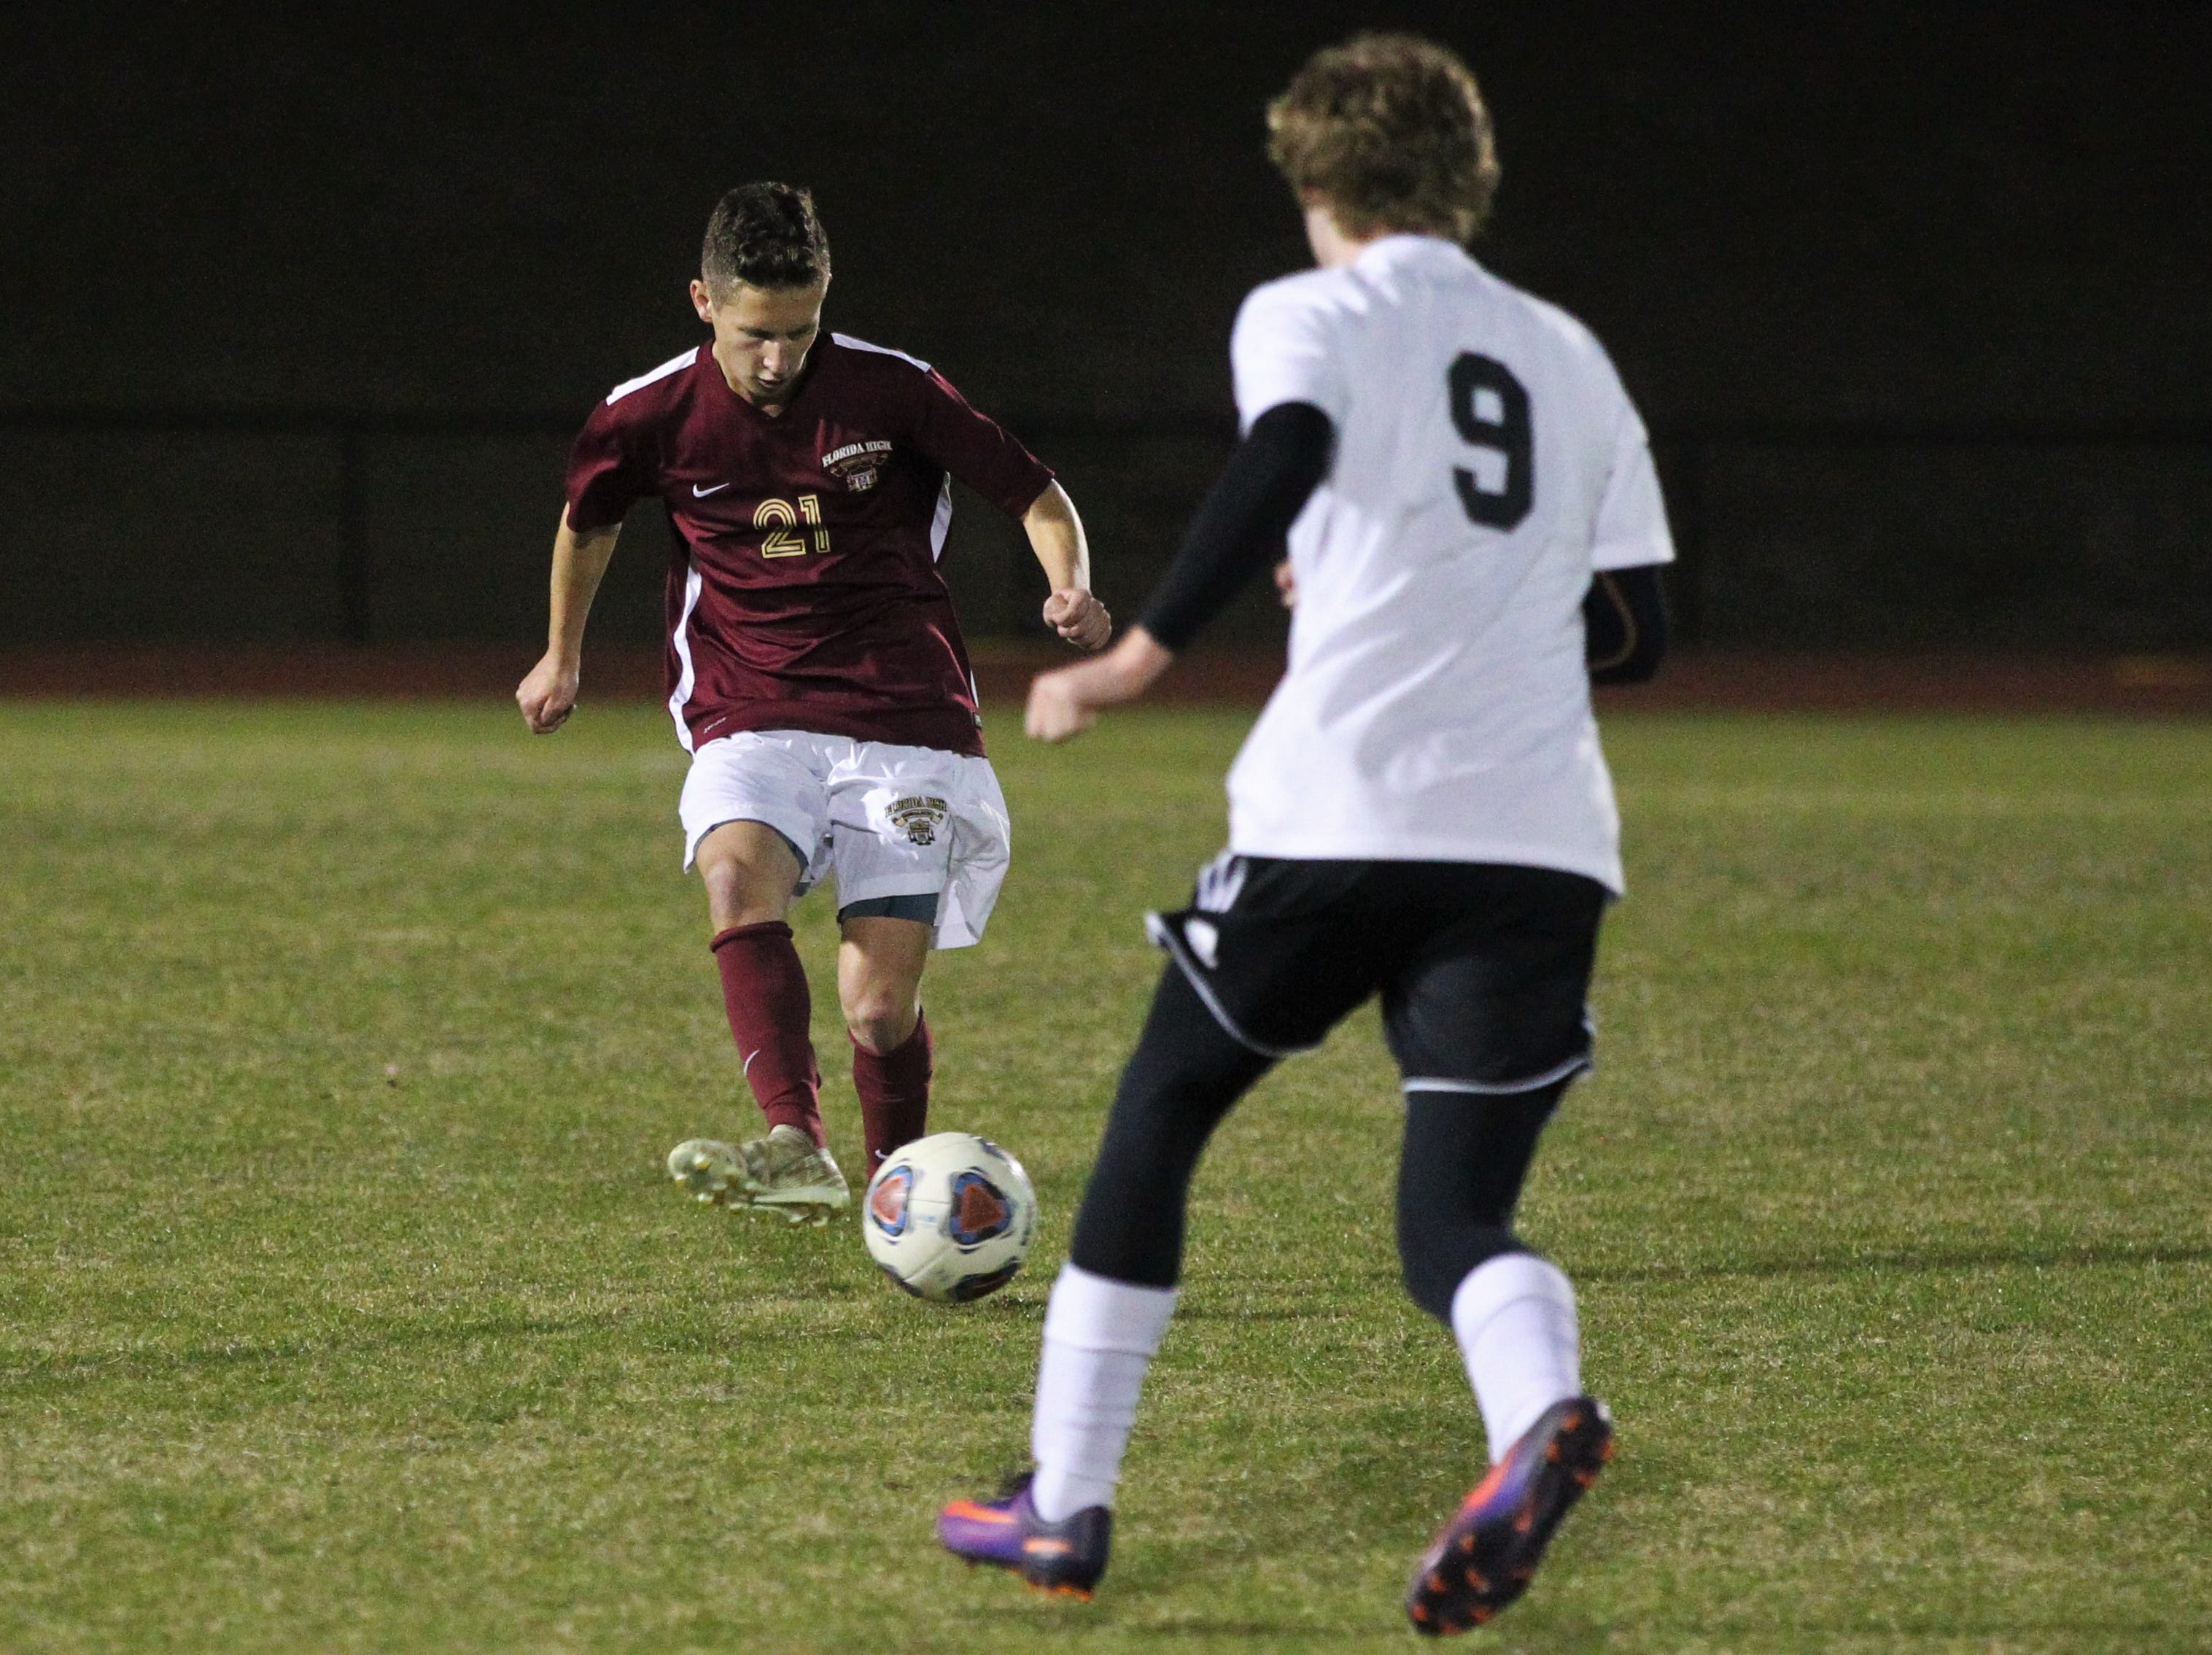 Florida High's Cole Dubois makes a pass upfield as Florida High's boys soccer team beat South Walton 2-0 during a Region 1-2A quarterfinal on Feb. 6, 2018.